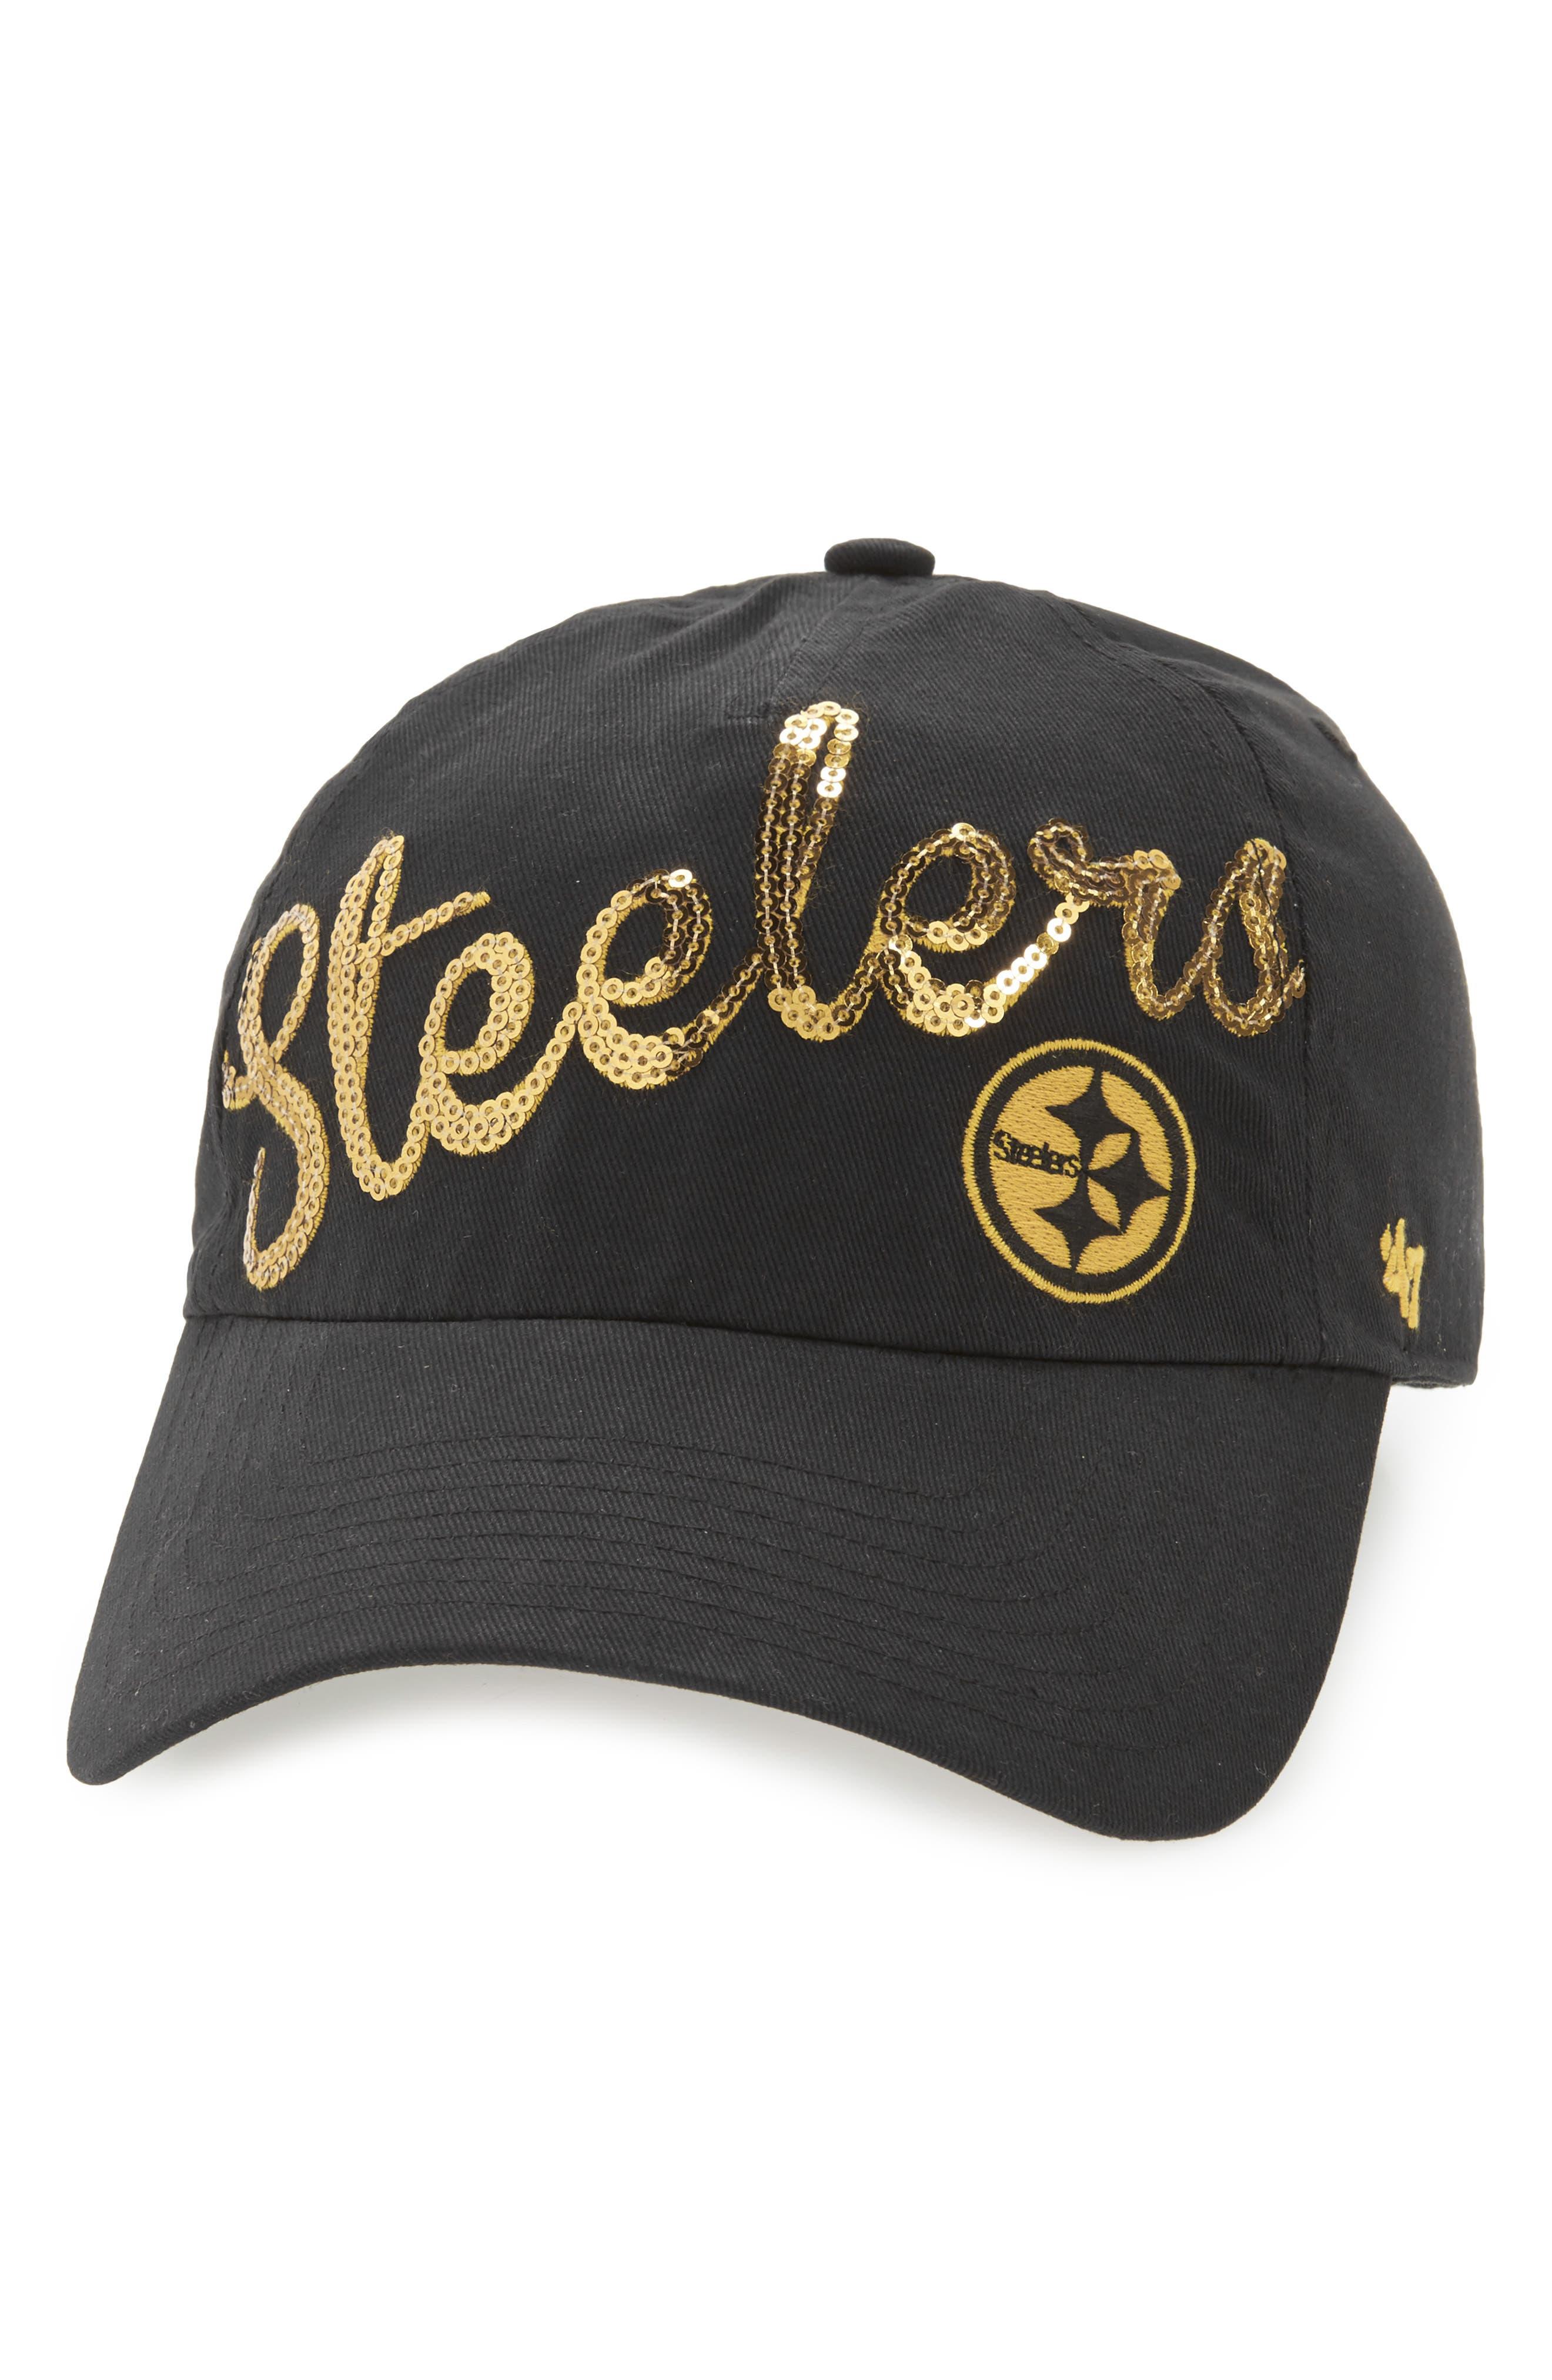 Pittsburgh Steelers Sparkle Cap,                             Main thumbnail 1, color,                             Black